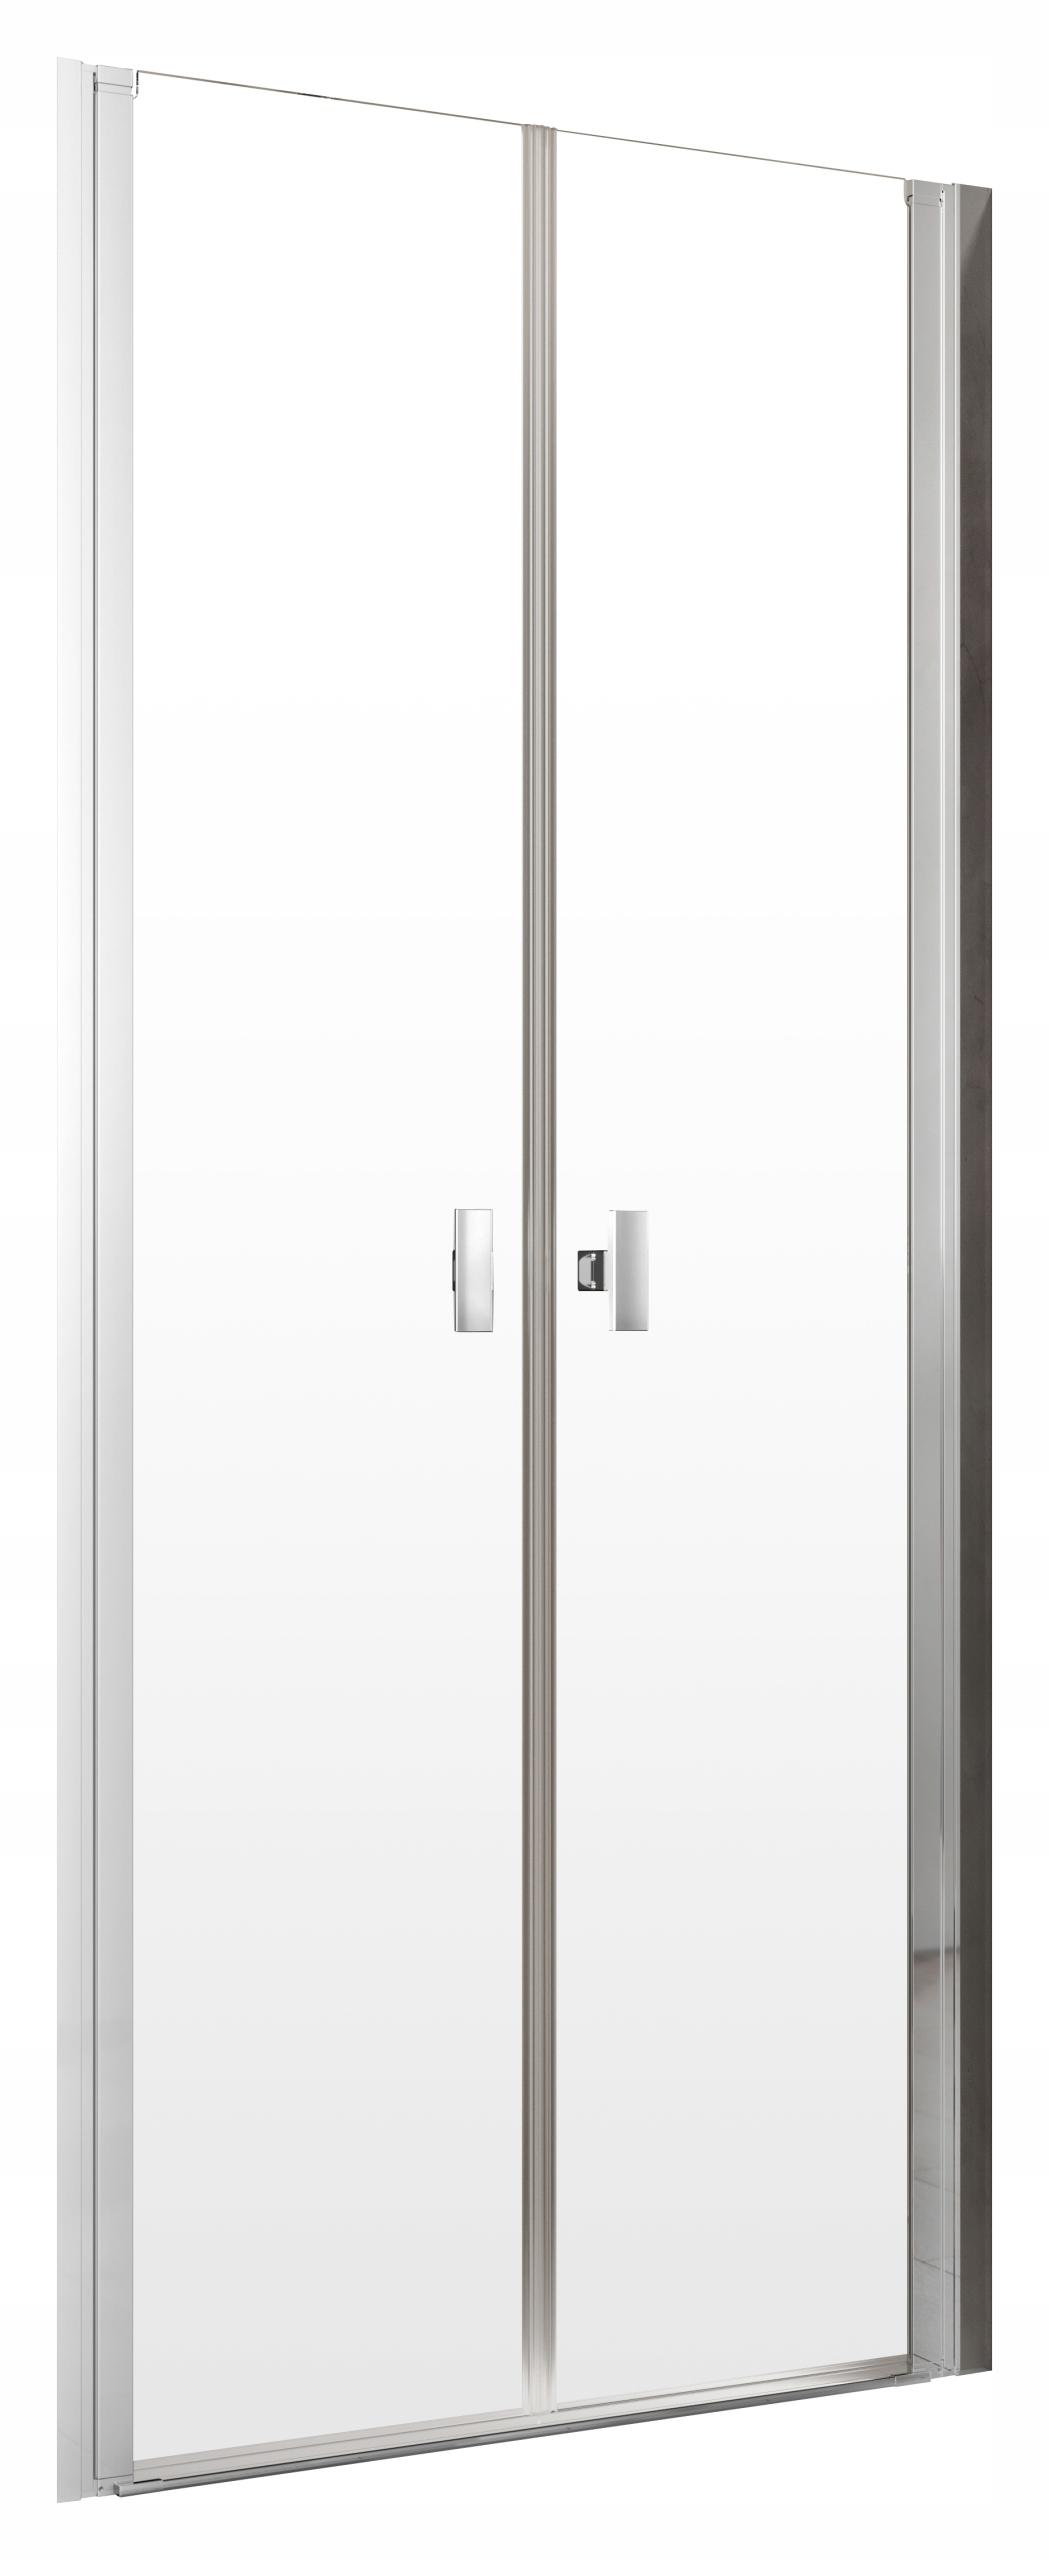 NES DWD I sprchové dvere 90x200 cm RADAWAY